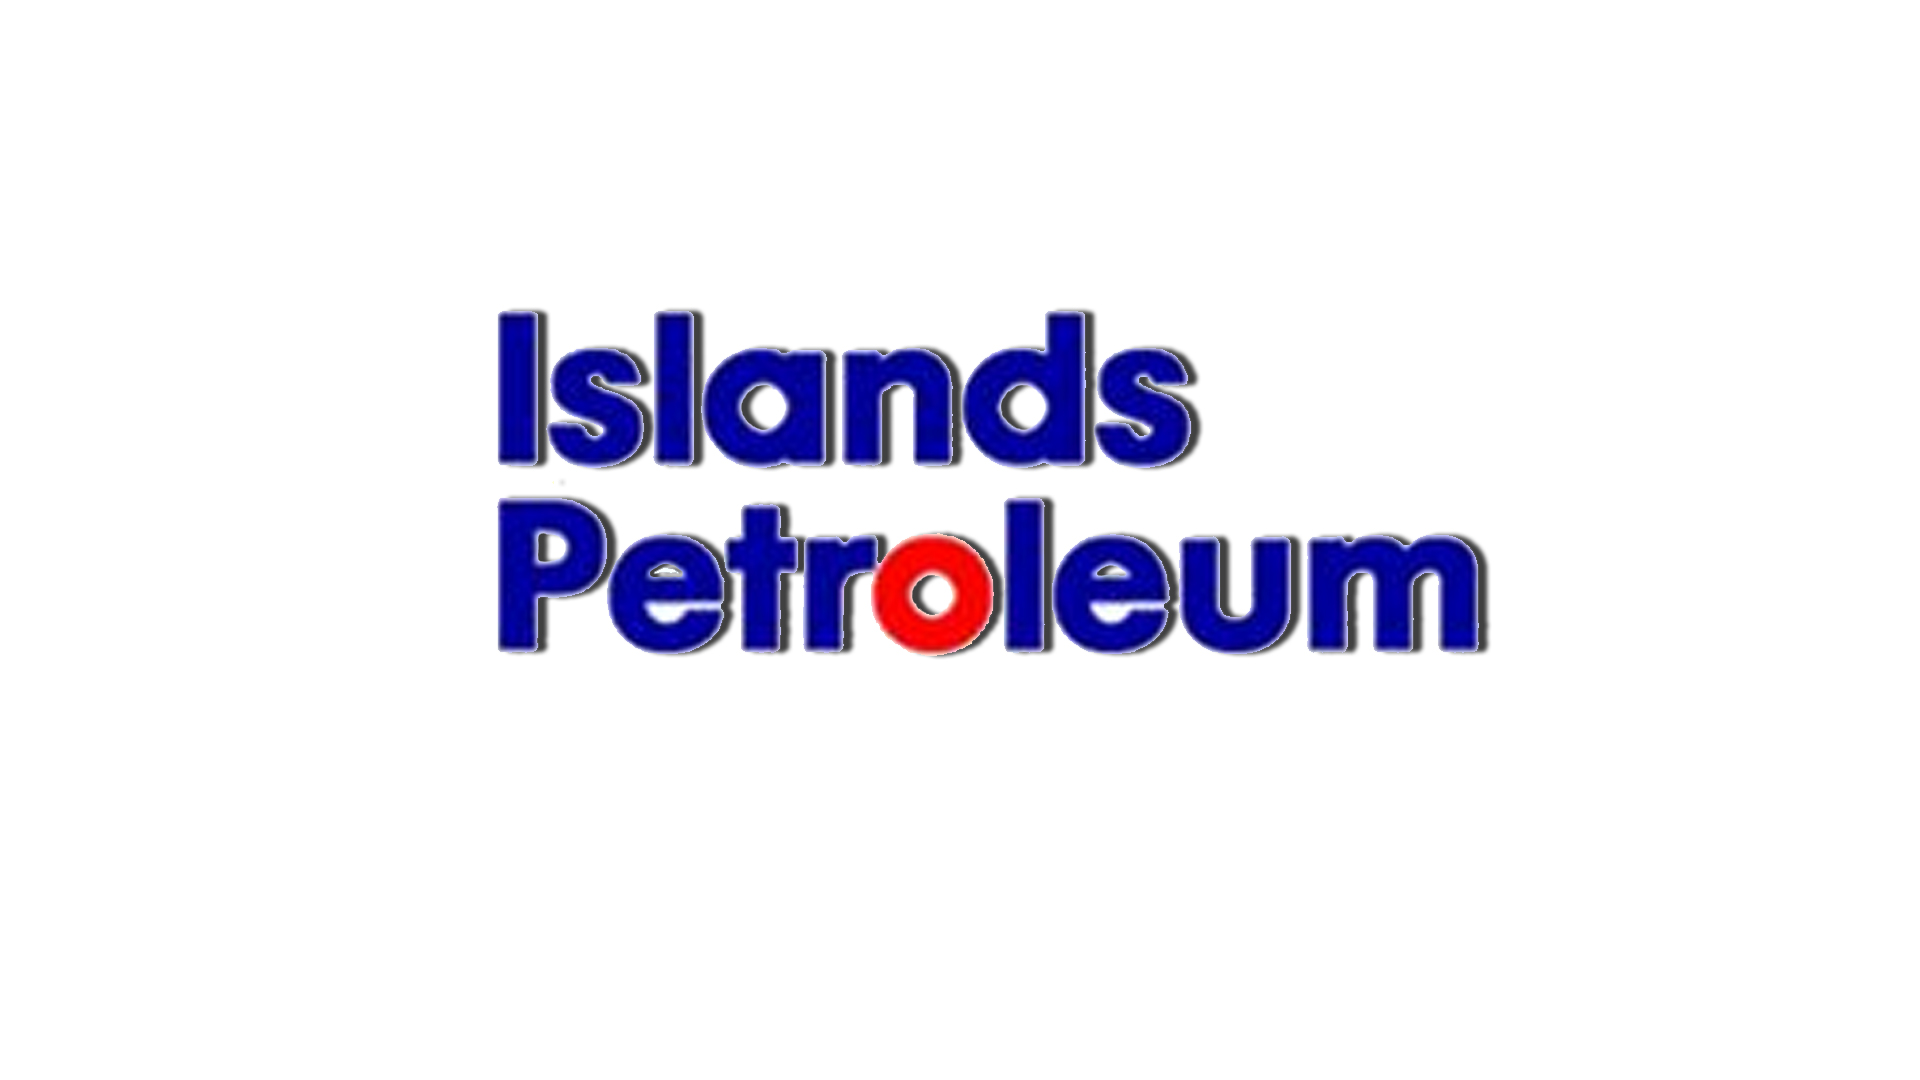 ISLANDS PETROLEUM